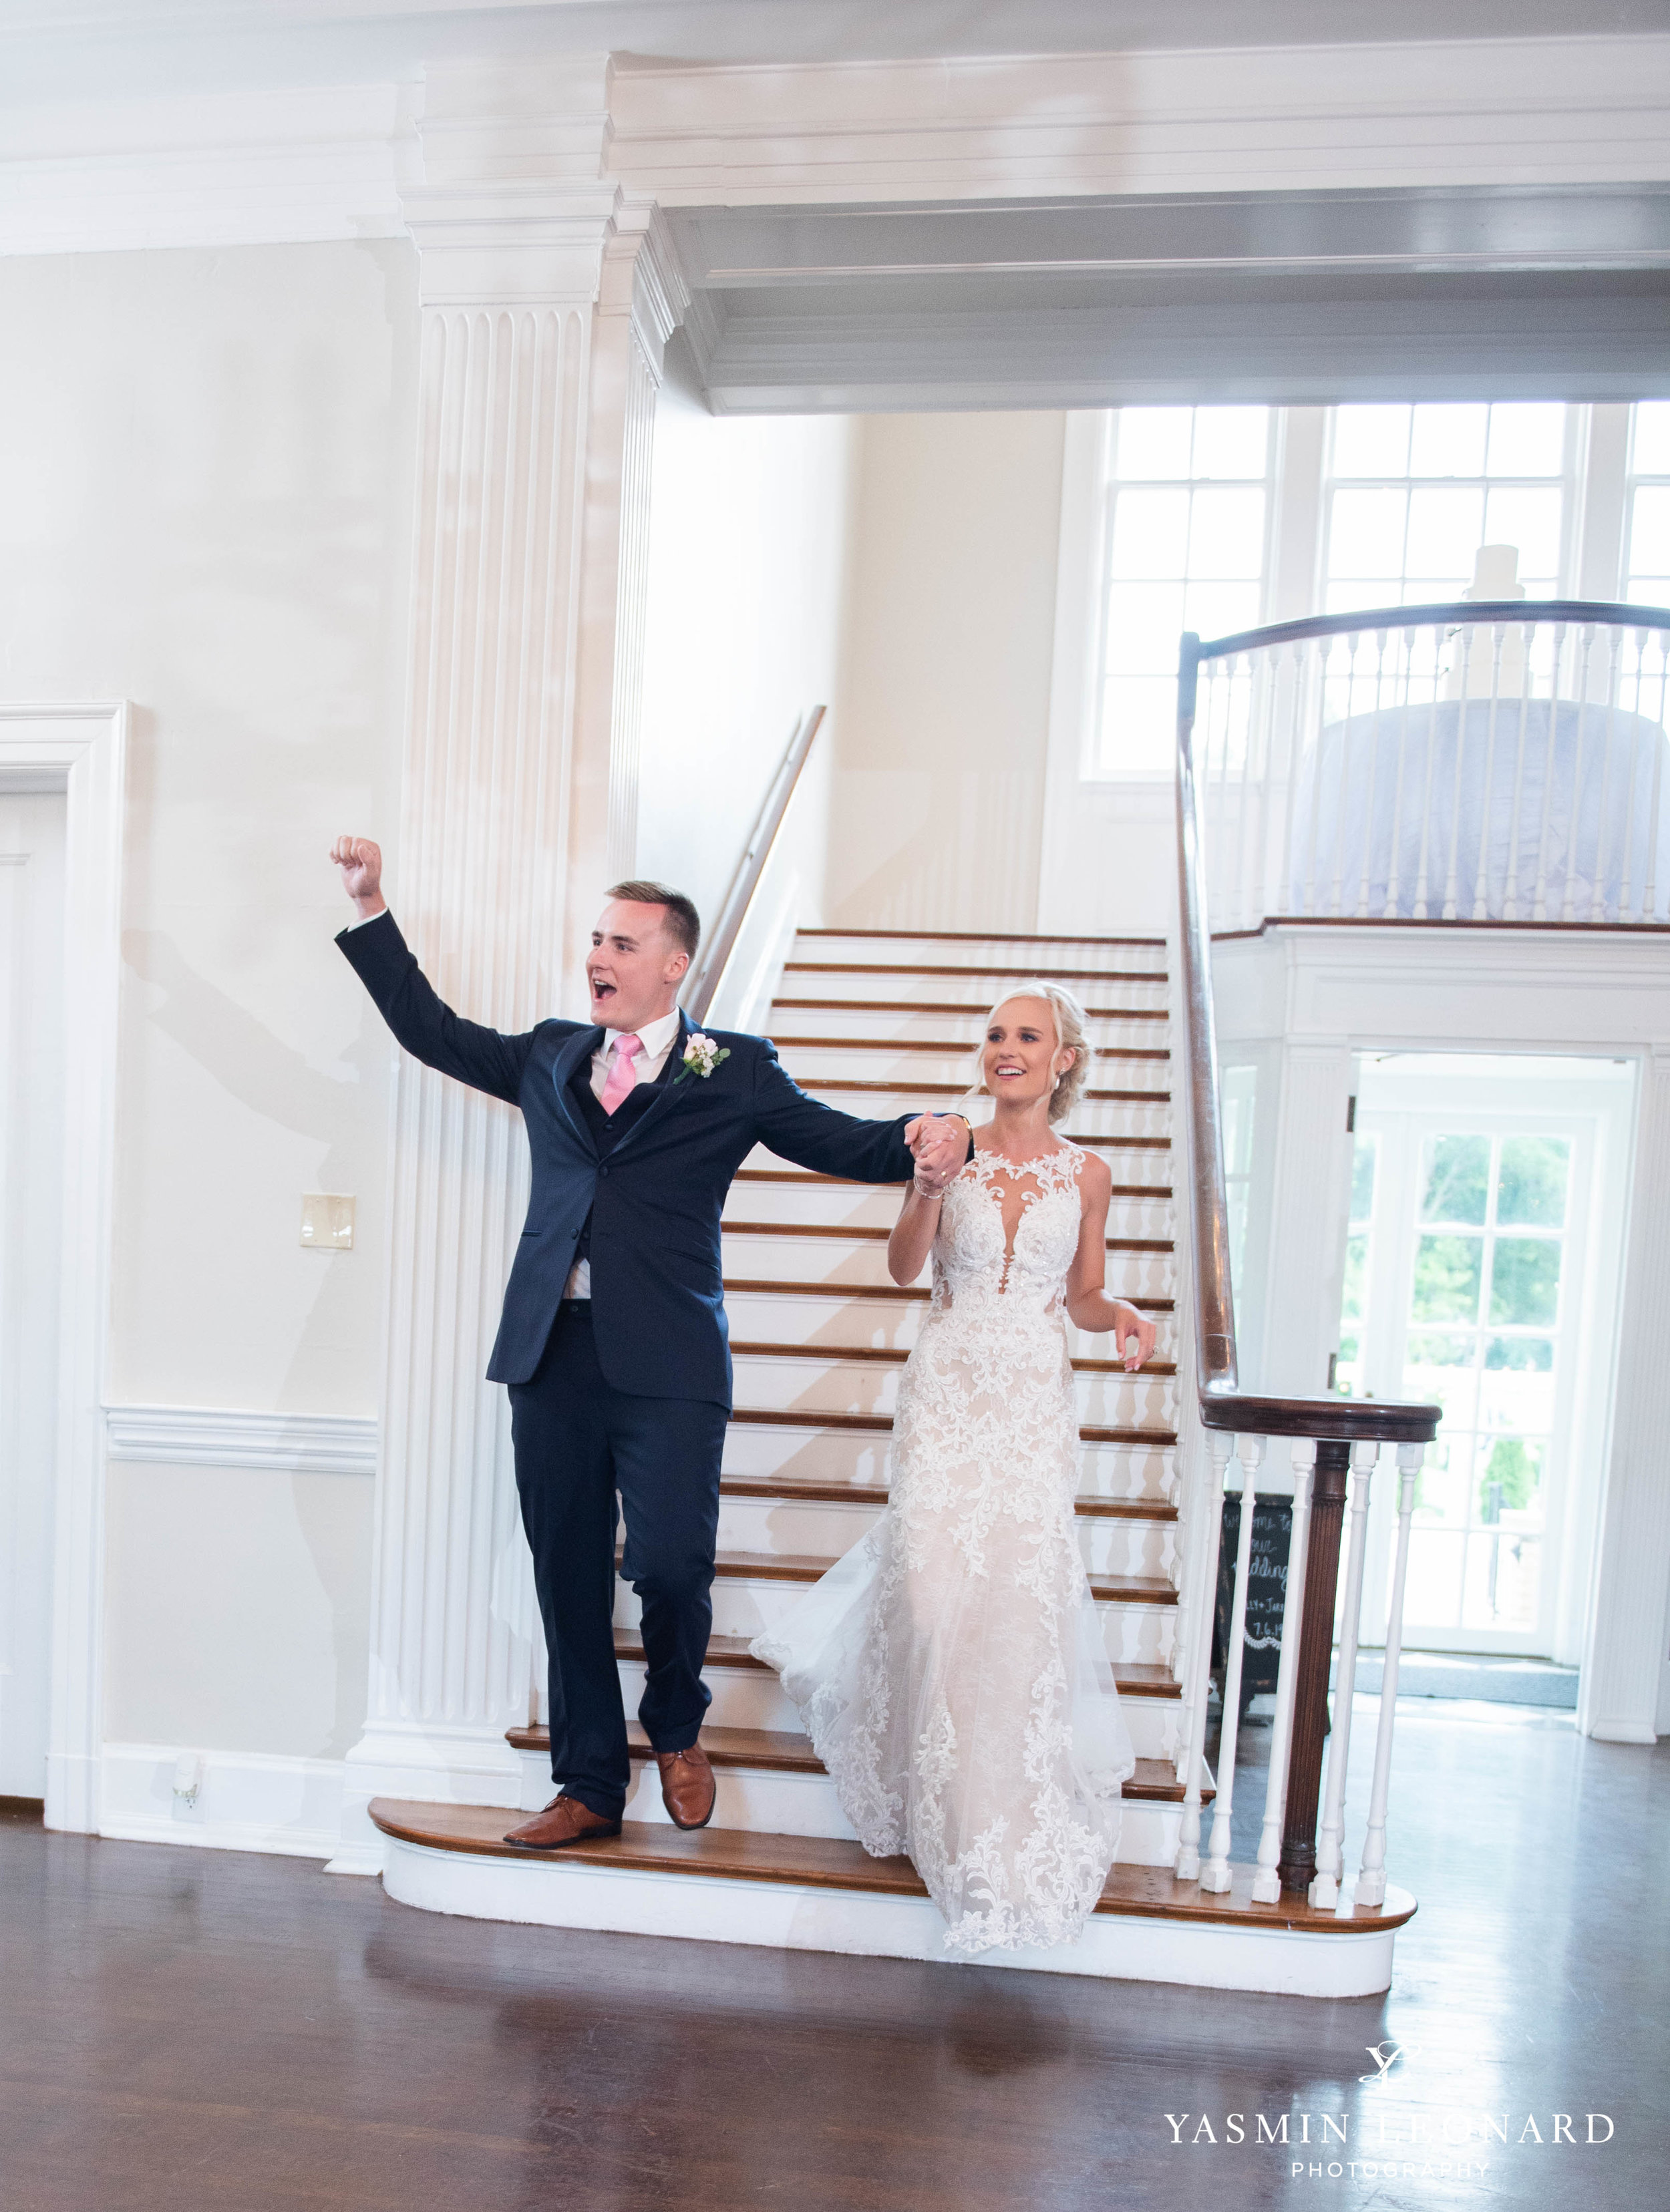 Separk Mansion - NC Weddings - Gastonia Wedding - NC Wedding Venues - Pink and Blue Wedding Ideas - Pink Bridesmaid Dresses - Yasmin Leonard Photography-44.jpg